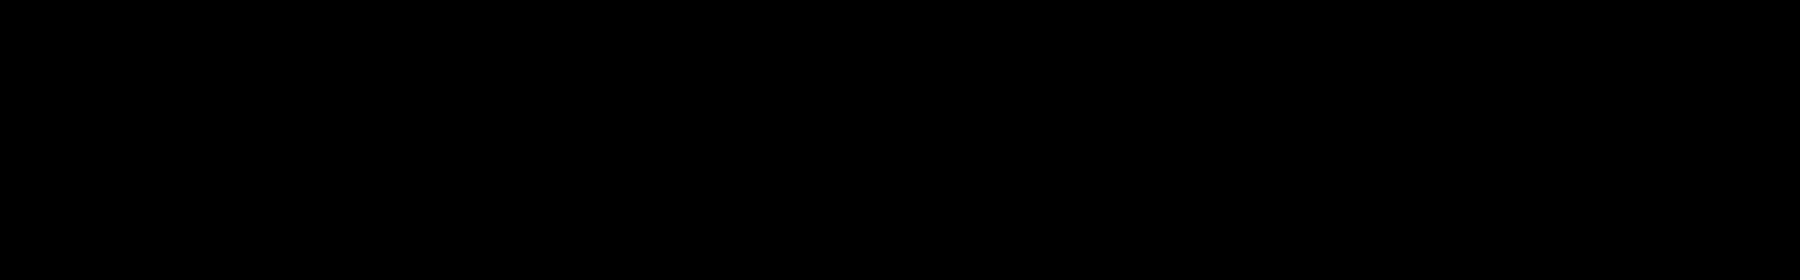 Daydreams - Lofi Guitar Jams audio waveform